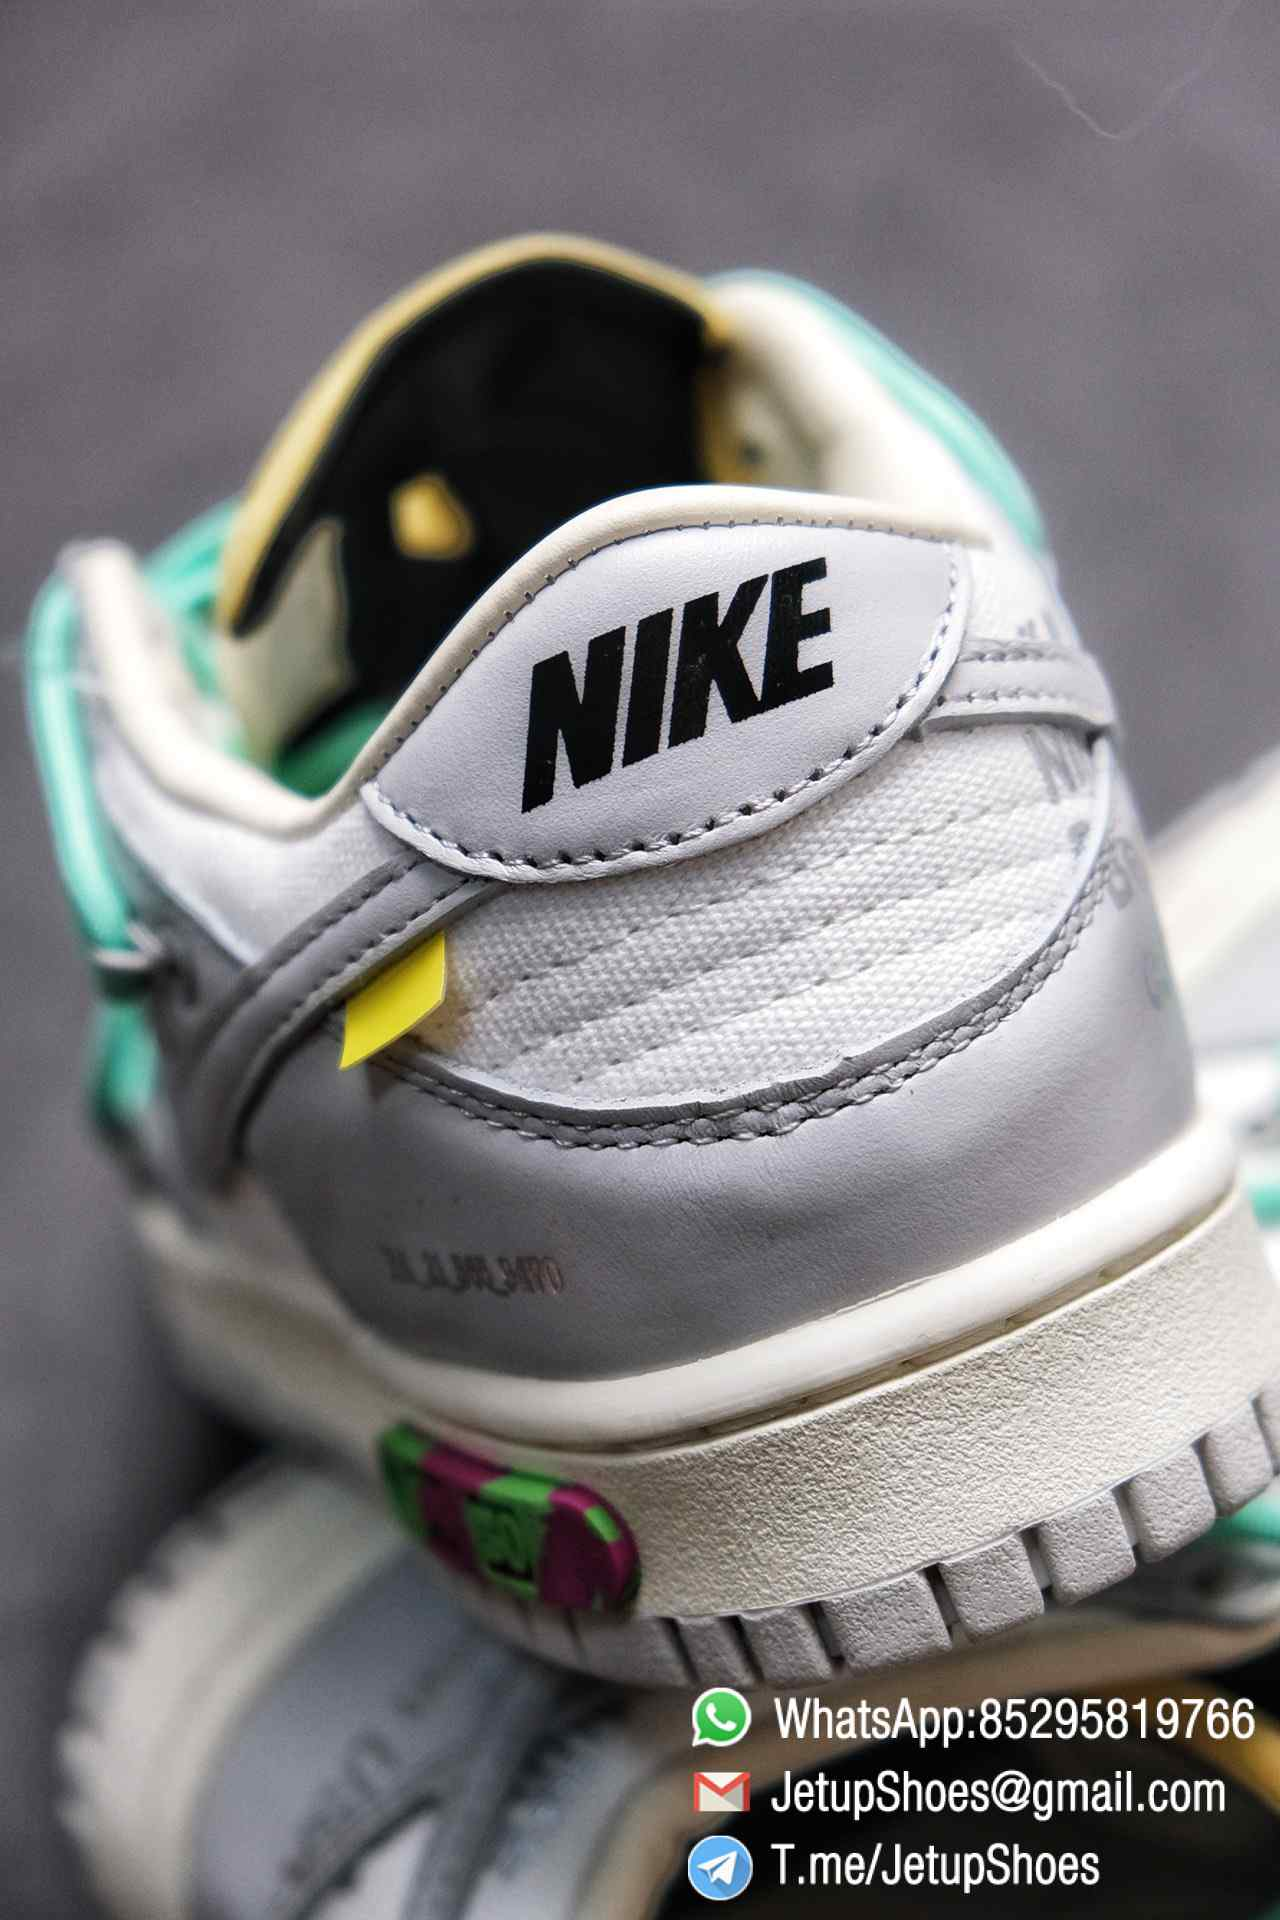 Best Replica Nike Sneakers 0ff White x Nike Dunk Low 04 of 50 SKU DM1602 114 Top RepSneakers Supplier 013